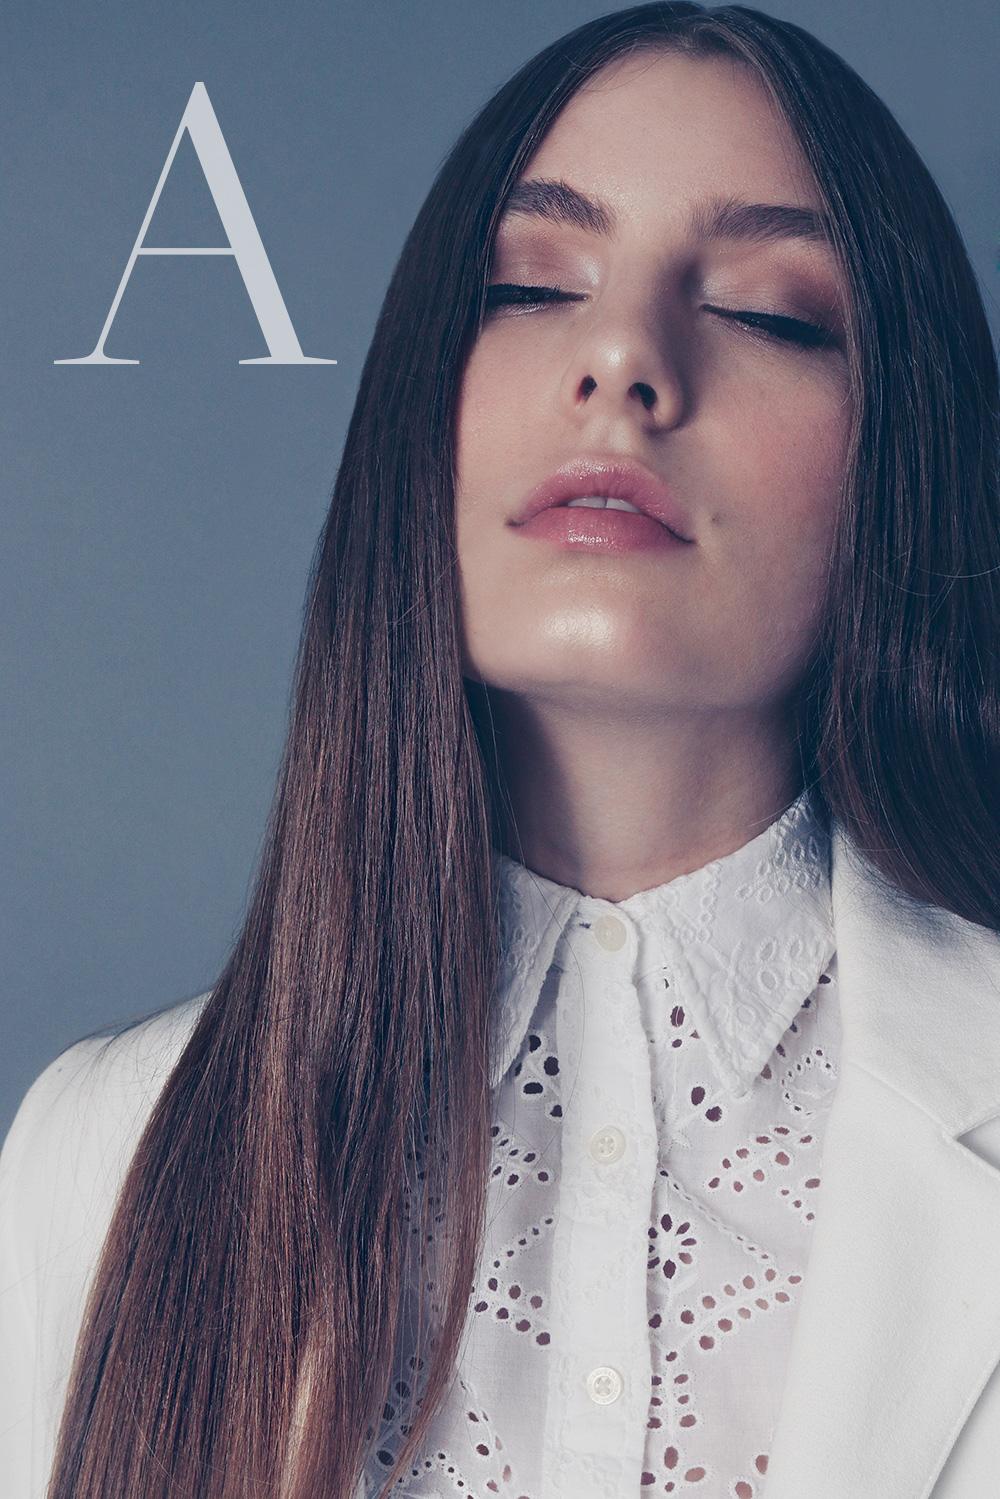 amora_beauty_studio_home_woman_fashion_model_indie_white_coat_eyes_closed_A.jpg